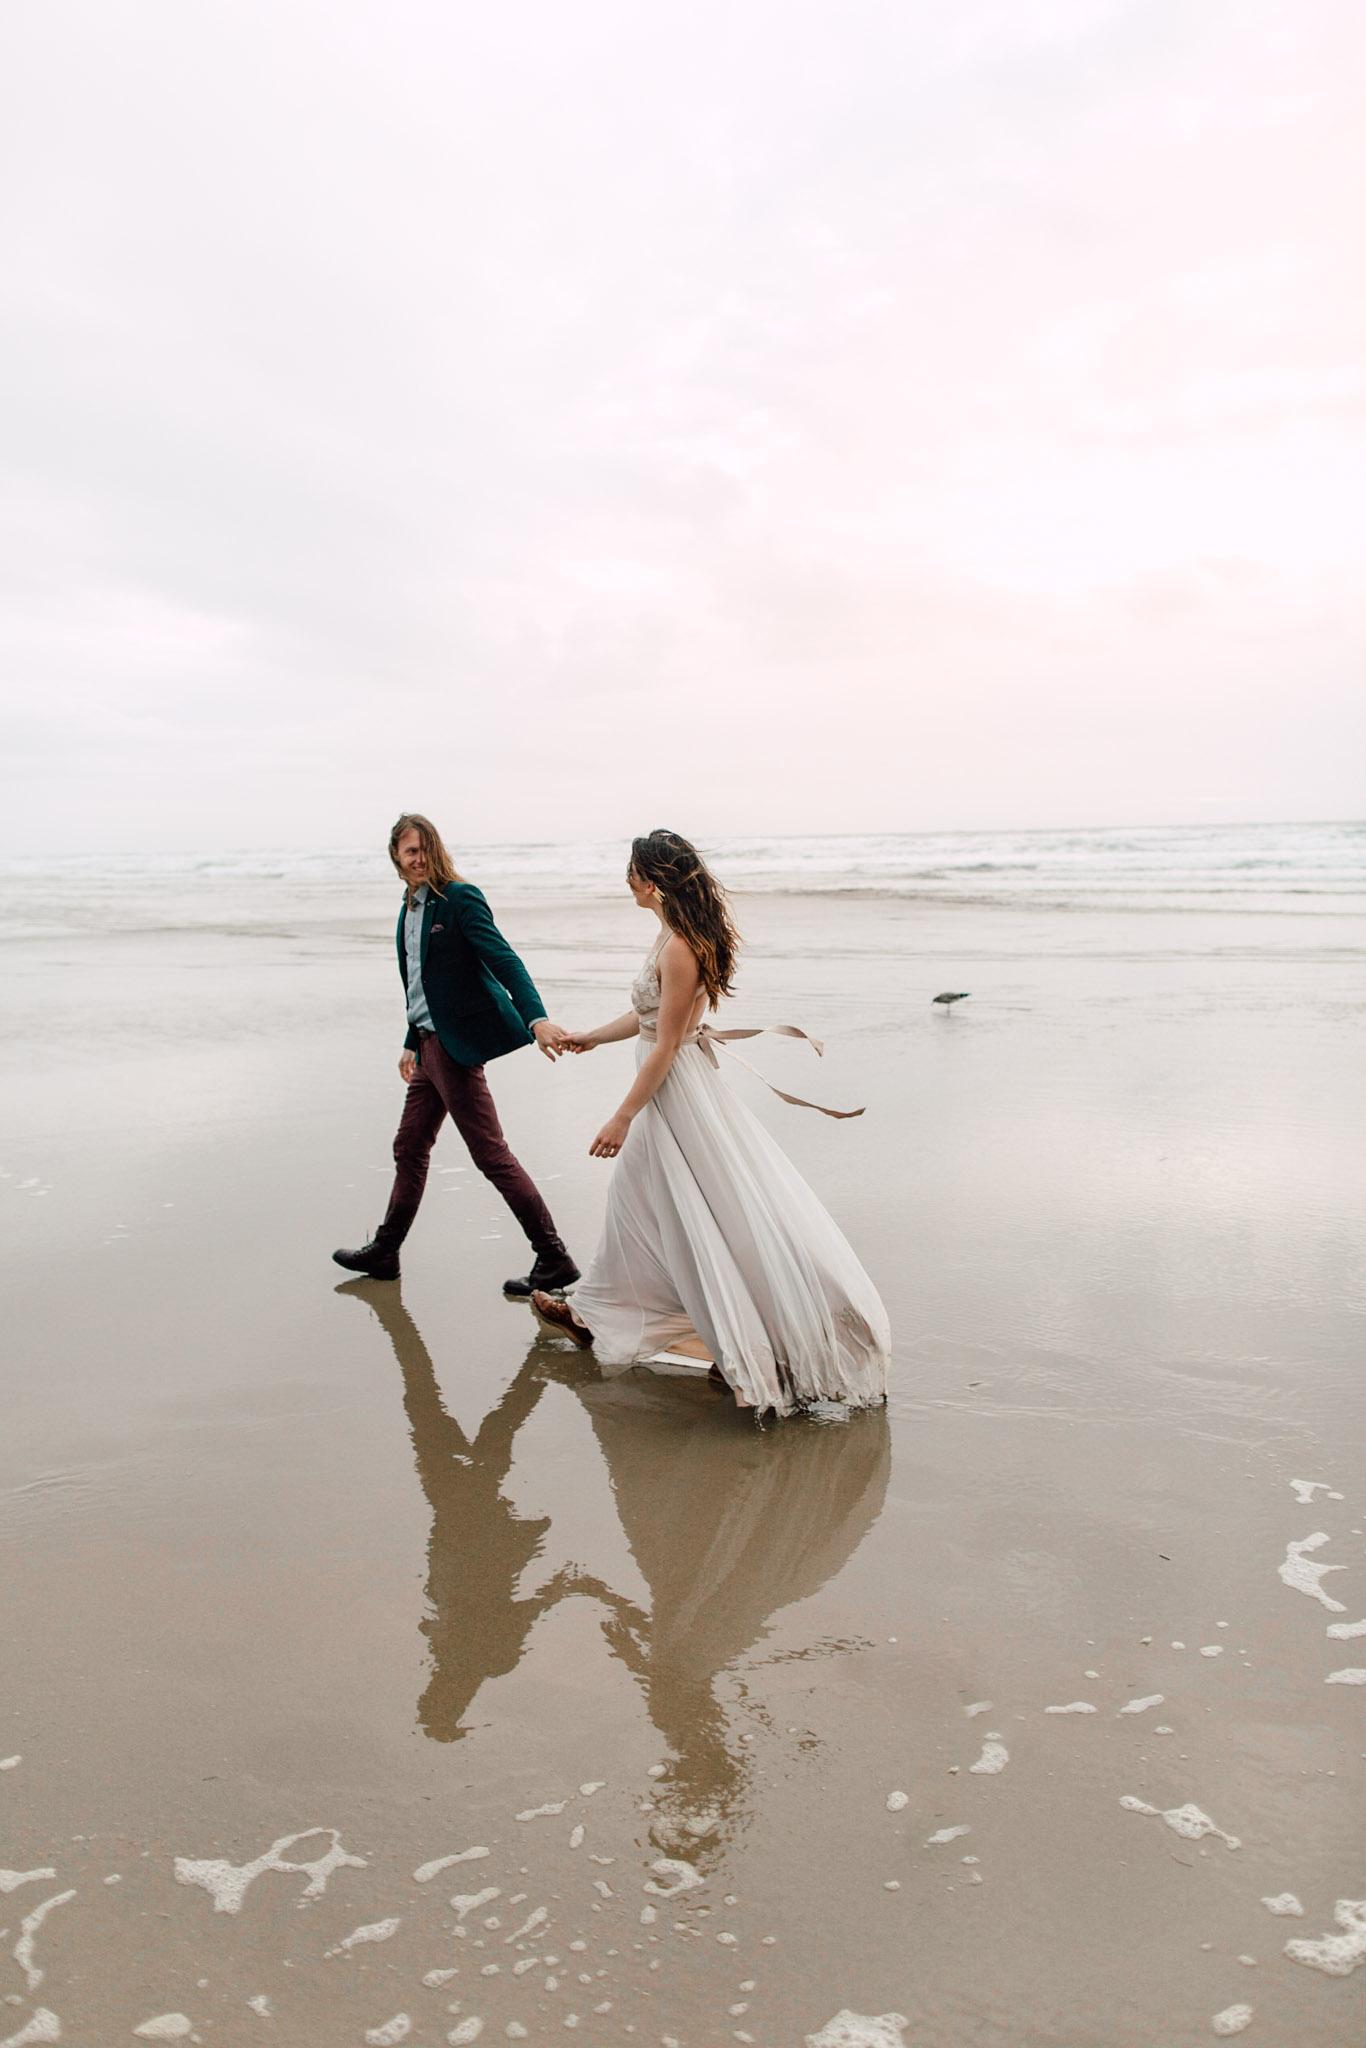 Oregon-Coast-Manzanita-Beach-Engagement-Pia-Anna-Christian-Wedding-Photography-PNW-GB-21.jpg